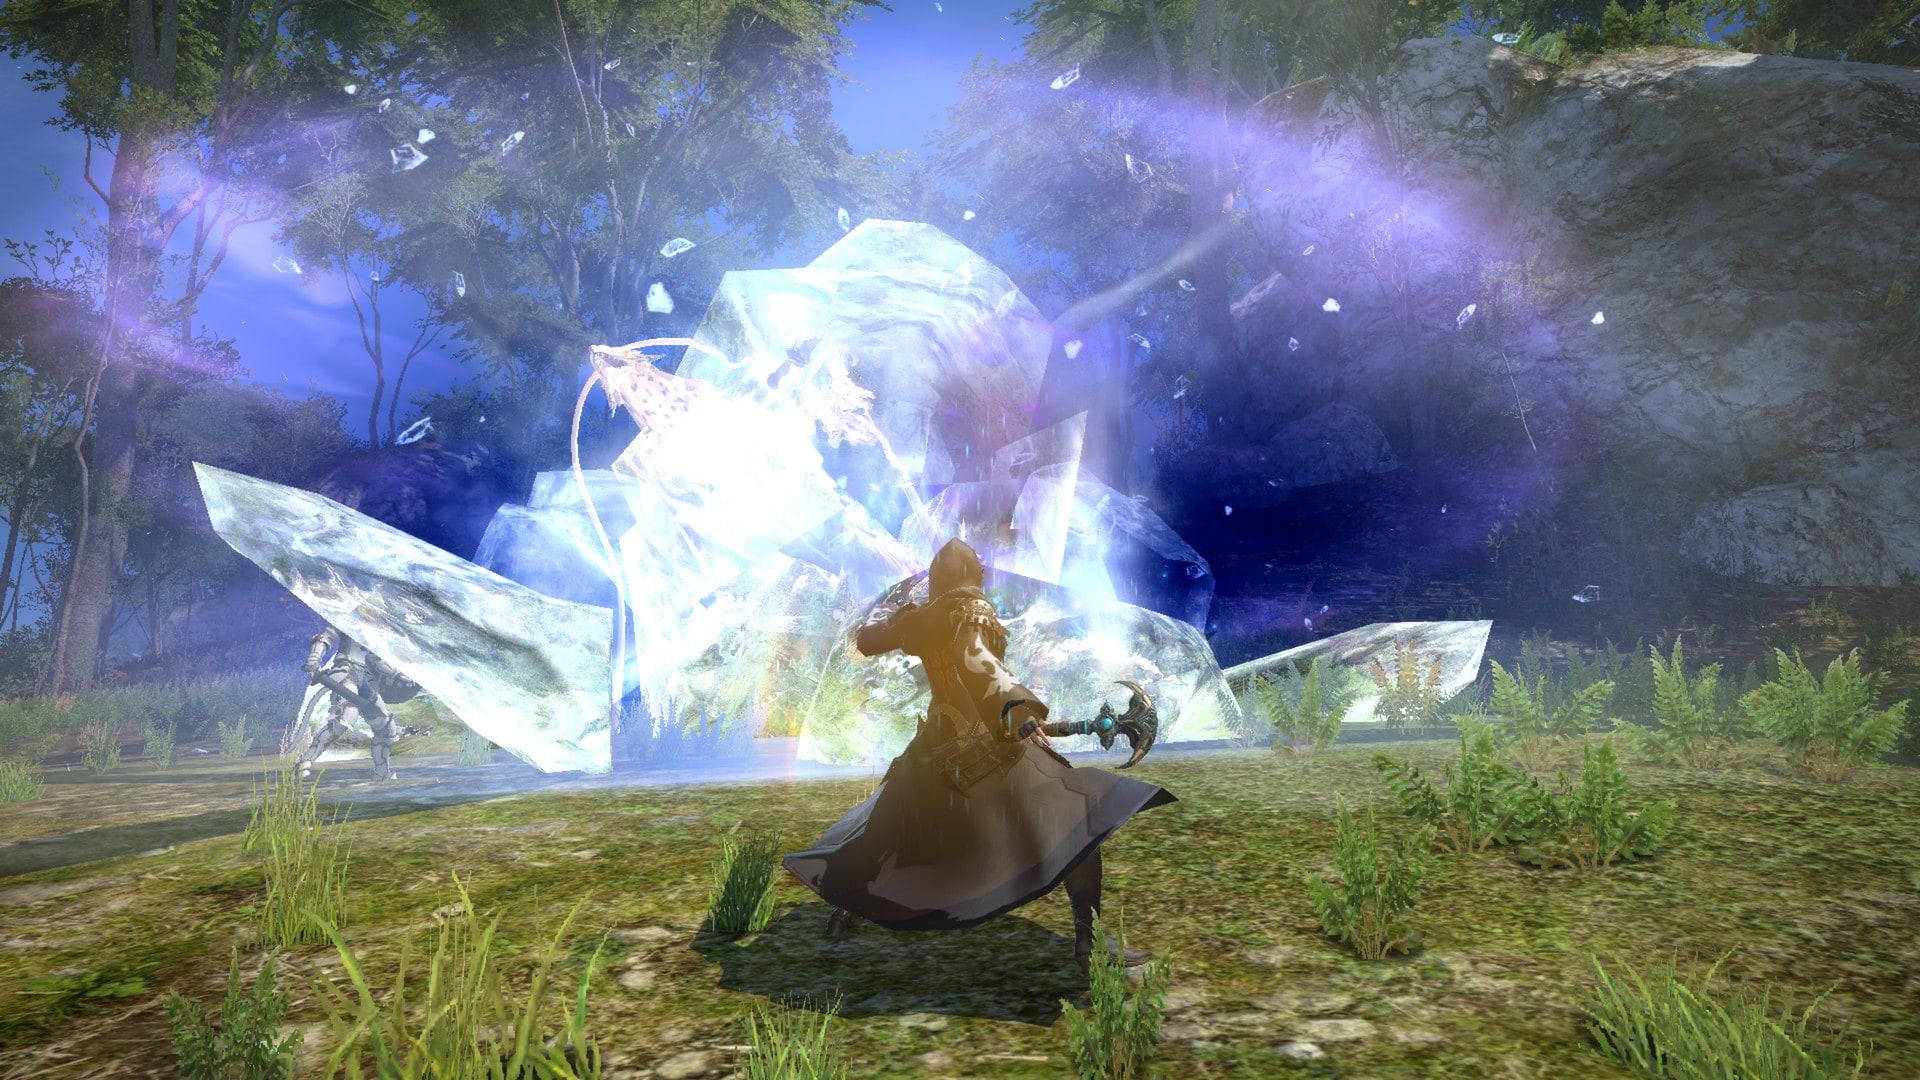 FINAL FANTASY XIV ONLINE COMPLETE EDITION Final Fantasy Key NORTH AMERICA - 3